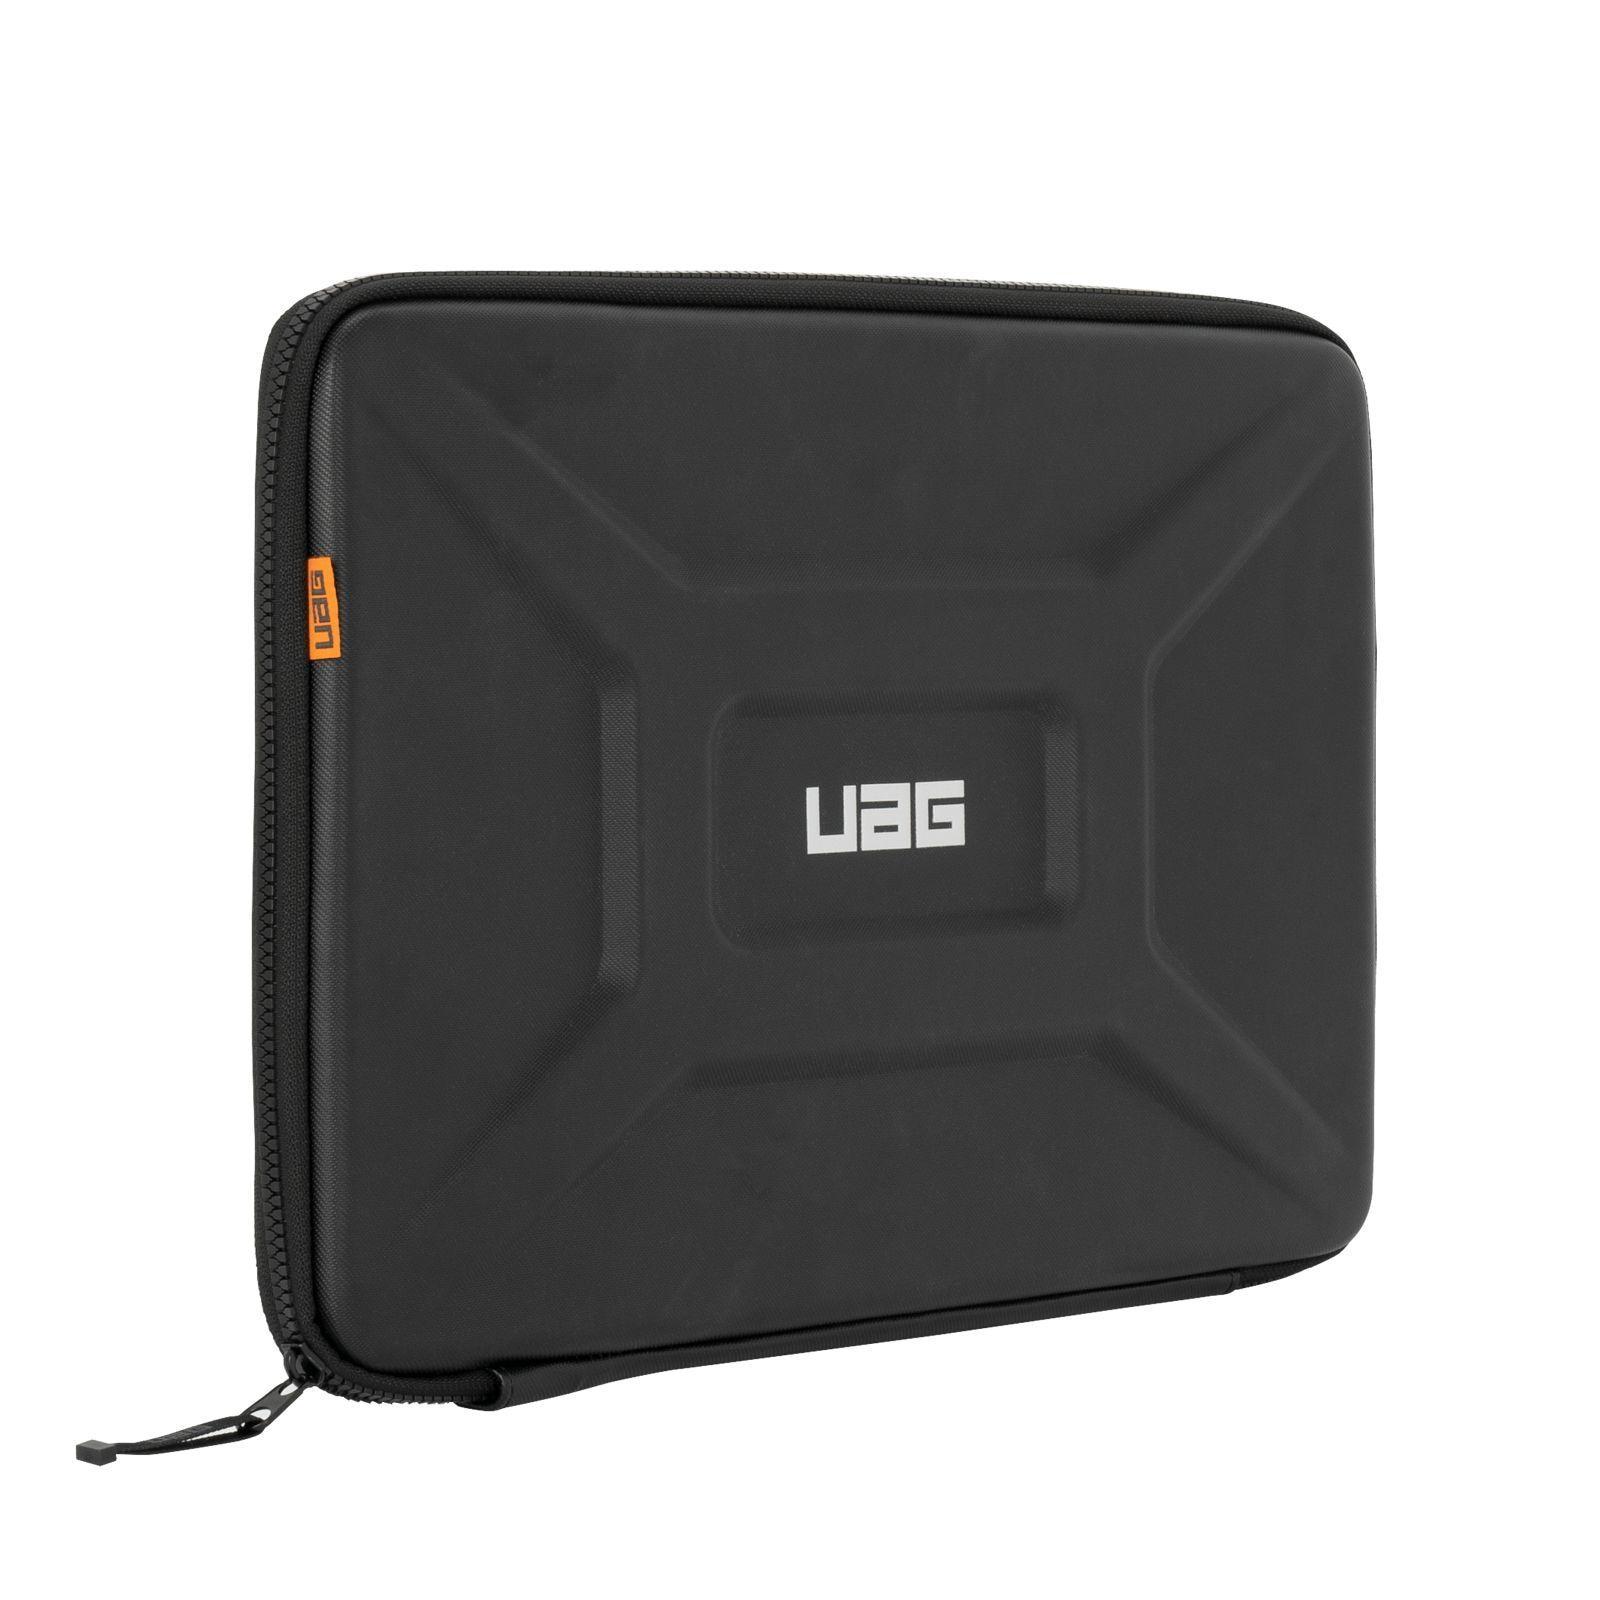 Laptop Sleeve Black - Large, upp till 15 tum